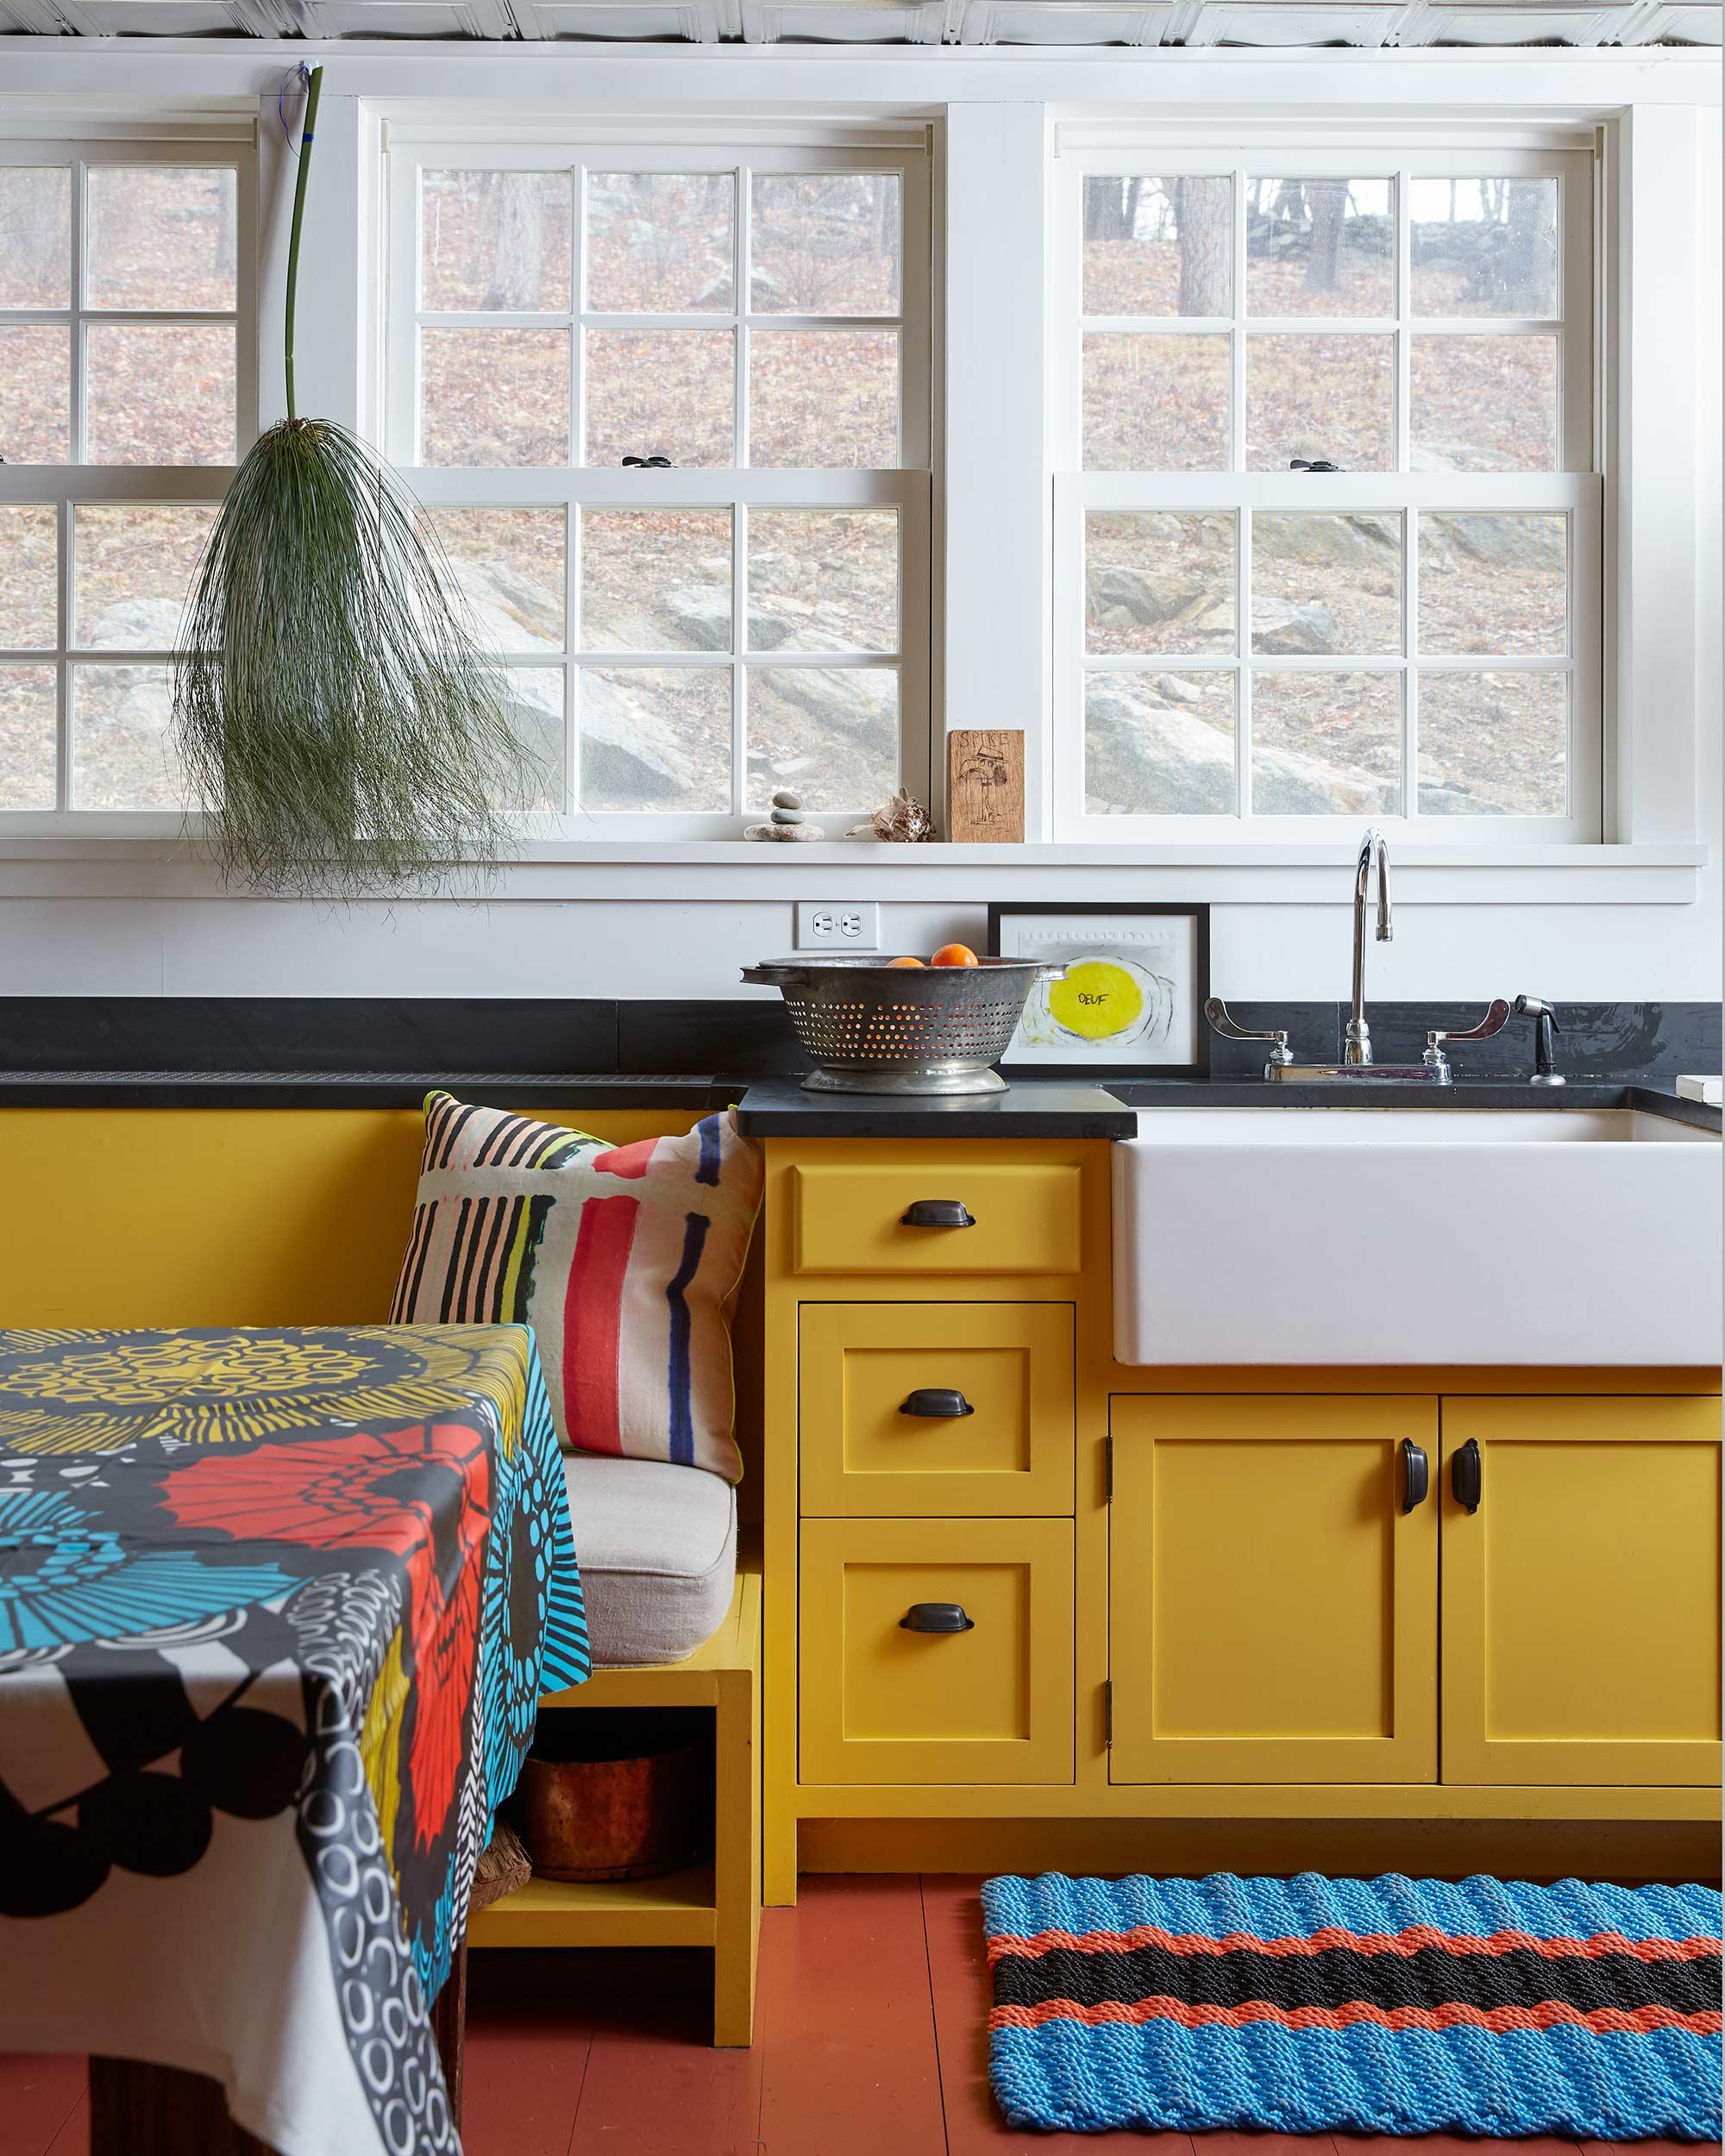 Kitchen_Windows_Porcelain_Sink_Marimekko.jpg